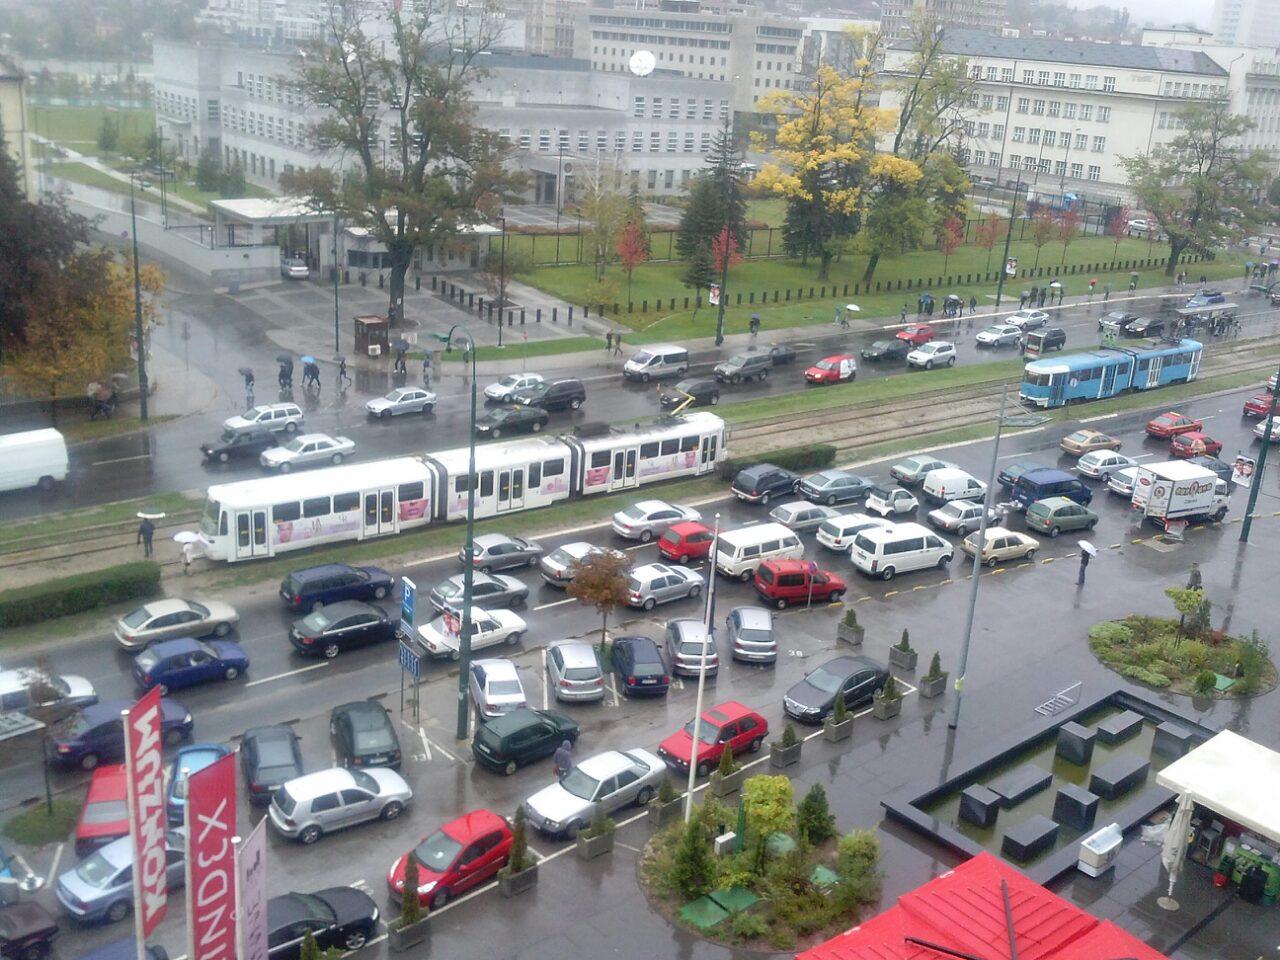 Public Transportation in Sarajevo Halted